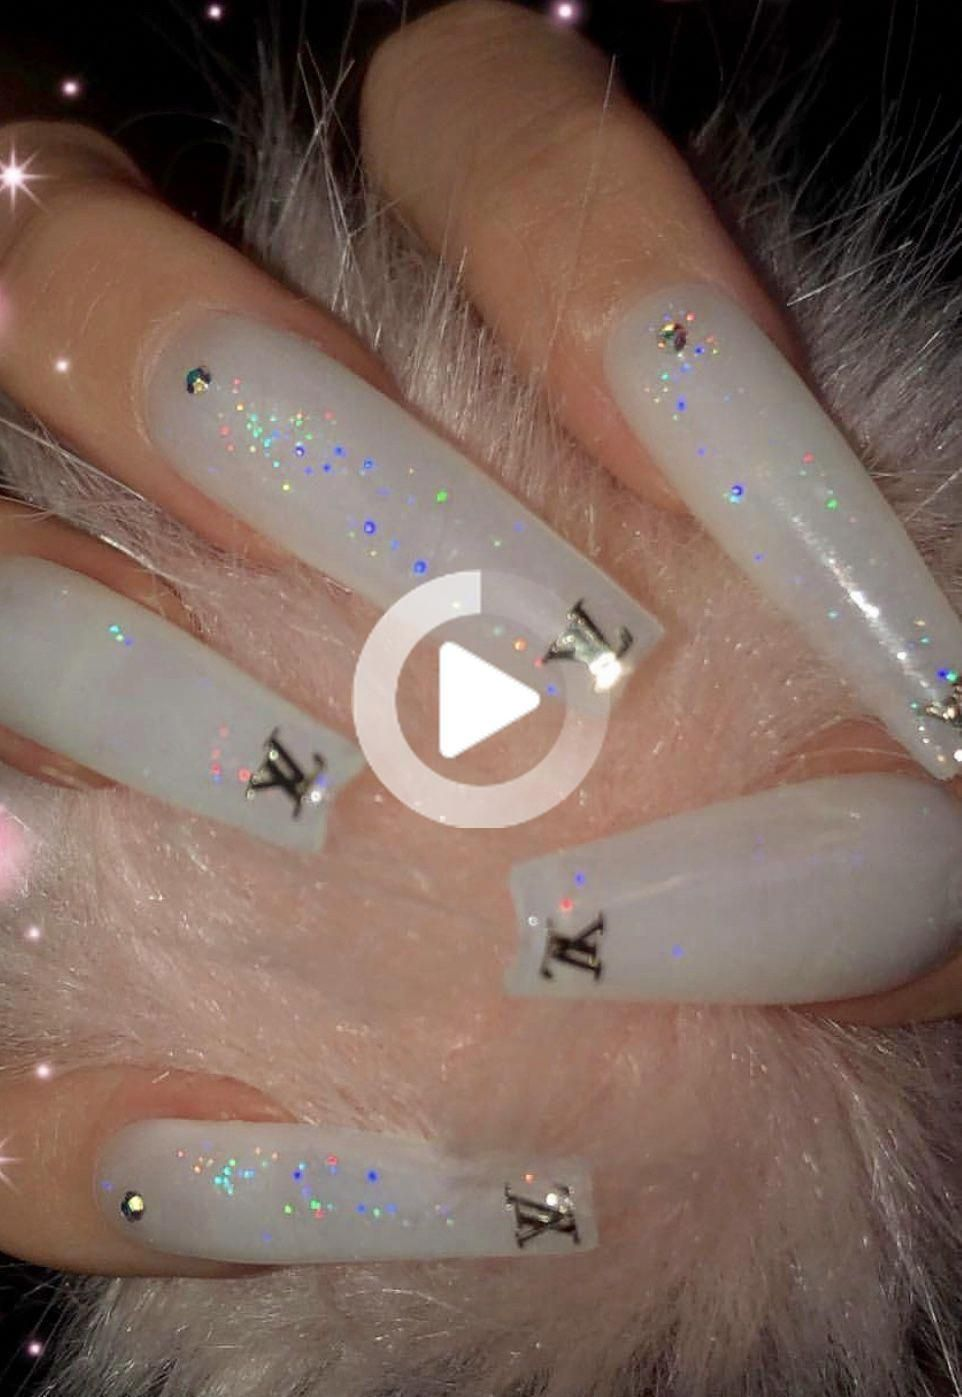 Ka La Kiss Lilacnails In 2020 Acrylic Nails Coffin Glitter Long Acrylic Nails Coffin Best Acrylic Nails